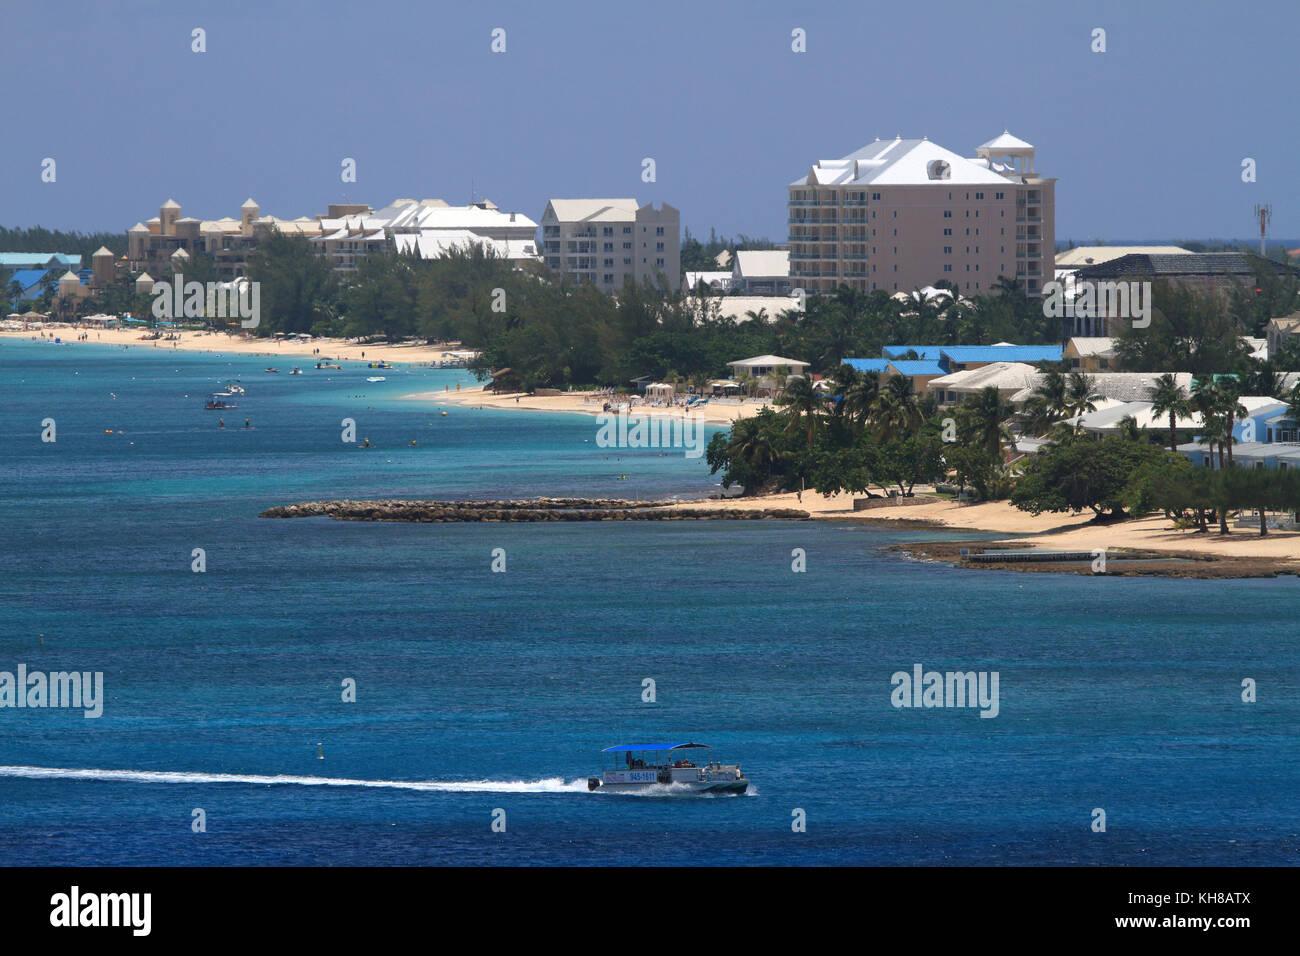 Beach Club Colony Cayman Islands